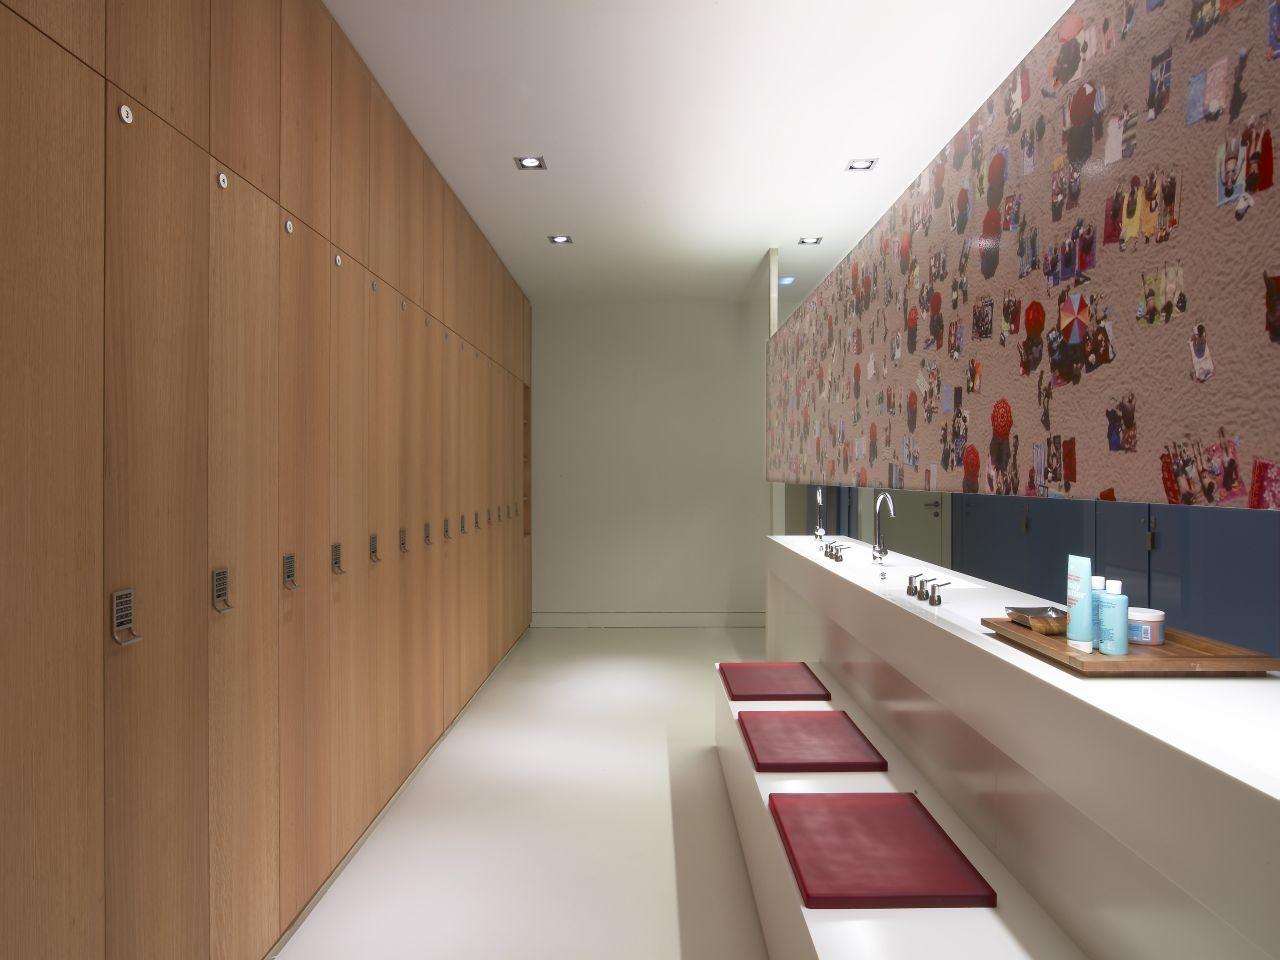 Gallery of w barcelona hotel ricardo bofill 19 for Spa hotel w barcelona